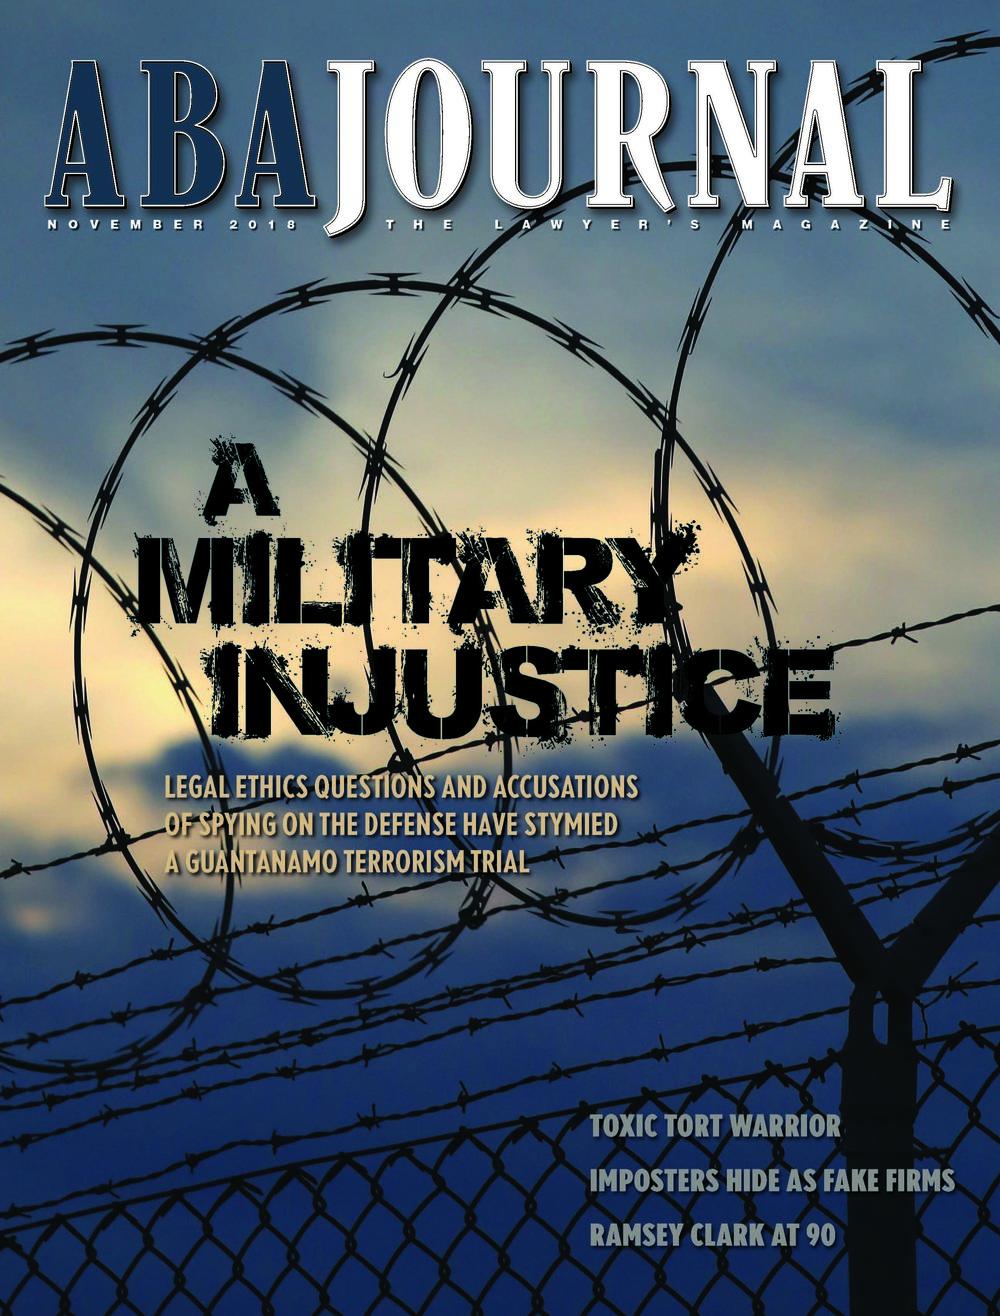 ABAJournal-militaryInjustice.jpg